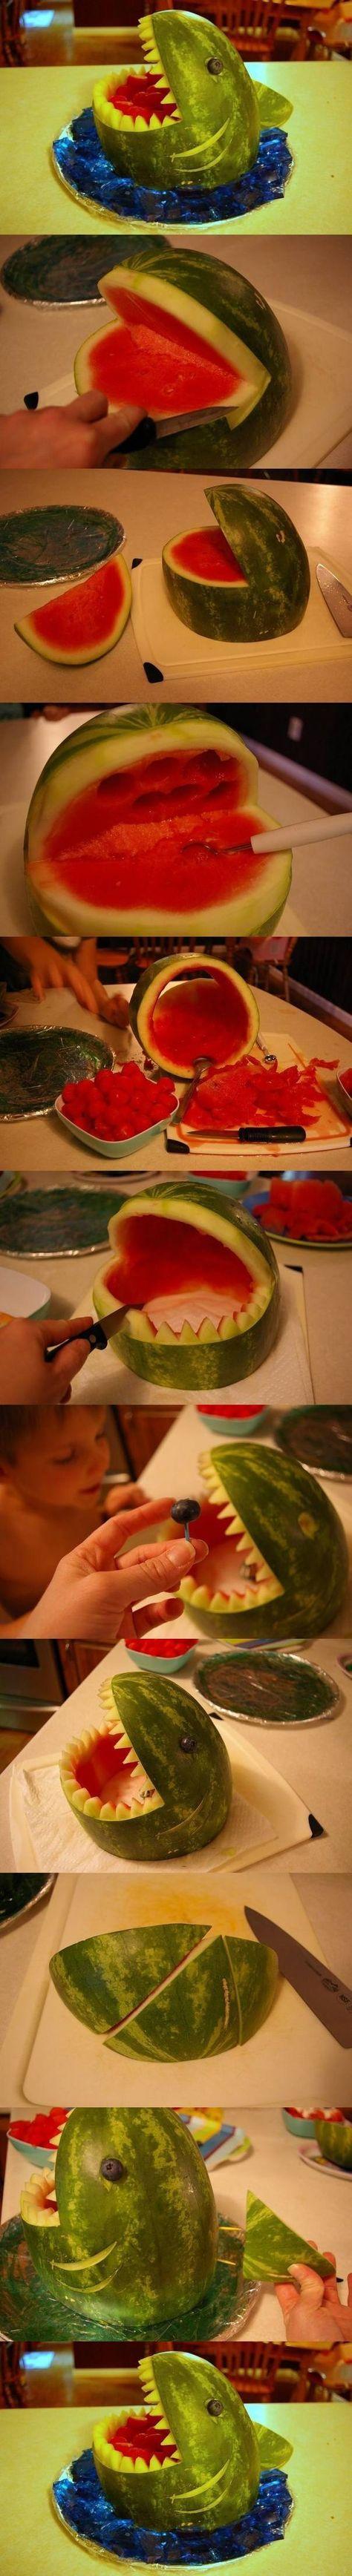 Food Art DIY - Watermelon Shark | iCreativeIdeas.com Like Us on Facebook ==> https://www.facebook.com/icreativeideas